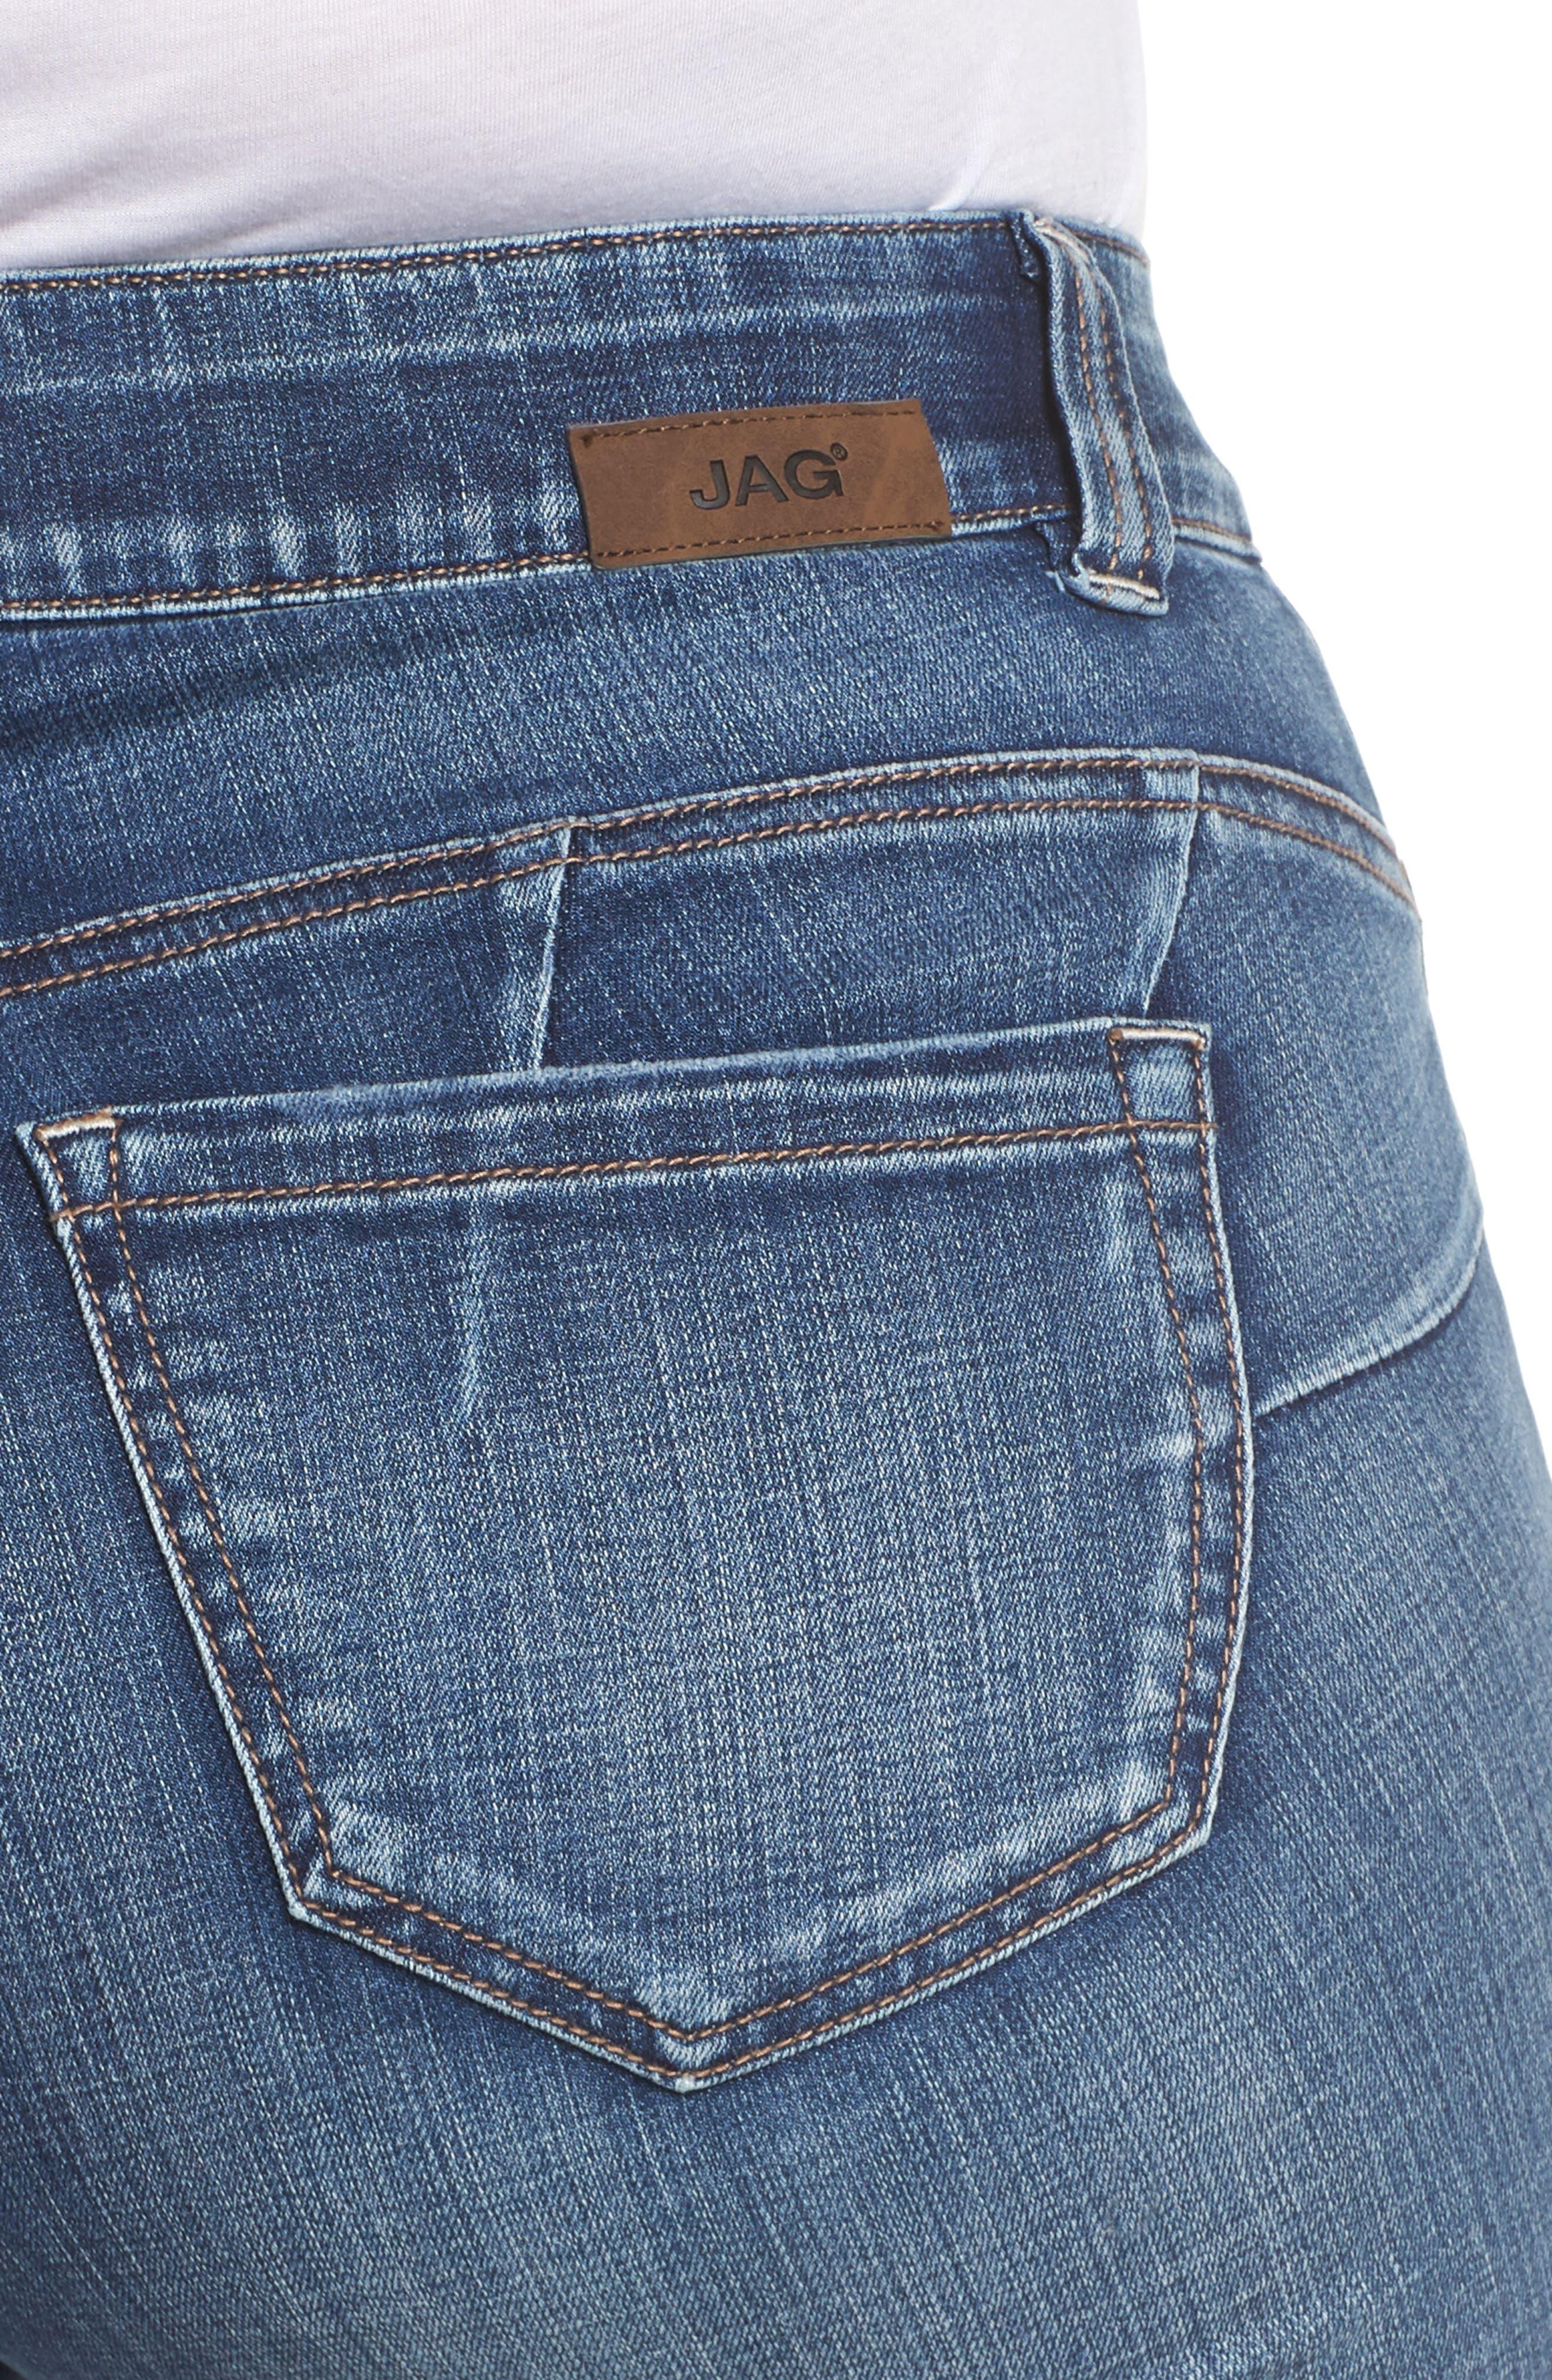 JAG JEANS, Eloise Bootcut Stretch Jeans, Alternate thumbnail 5, color, MED INDIGO